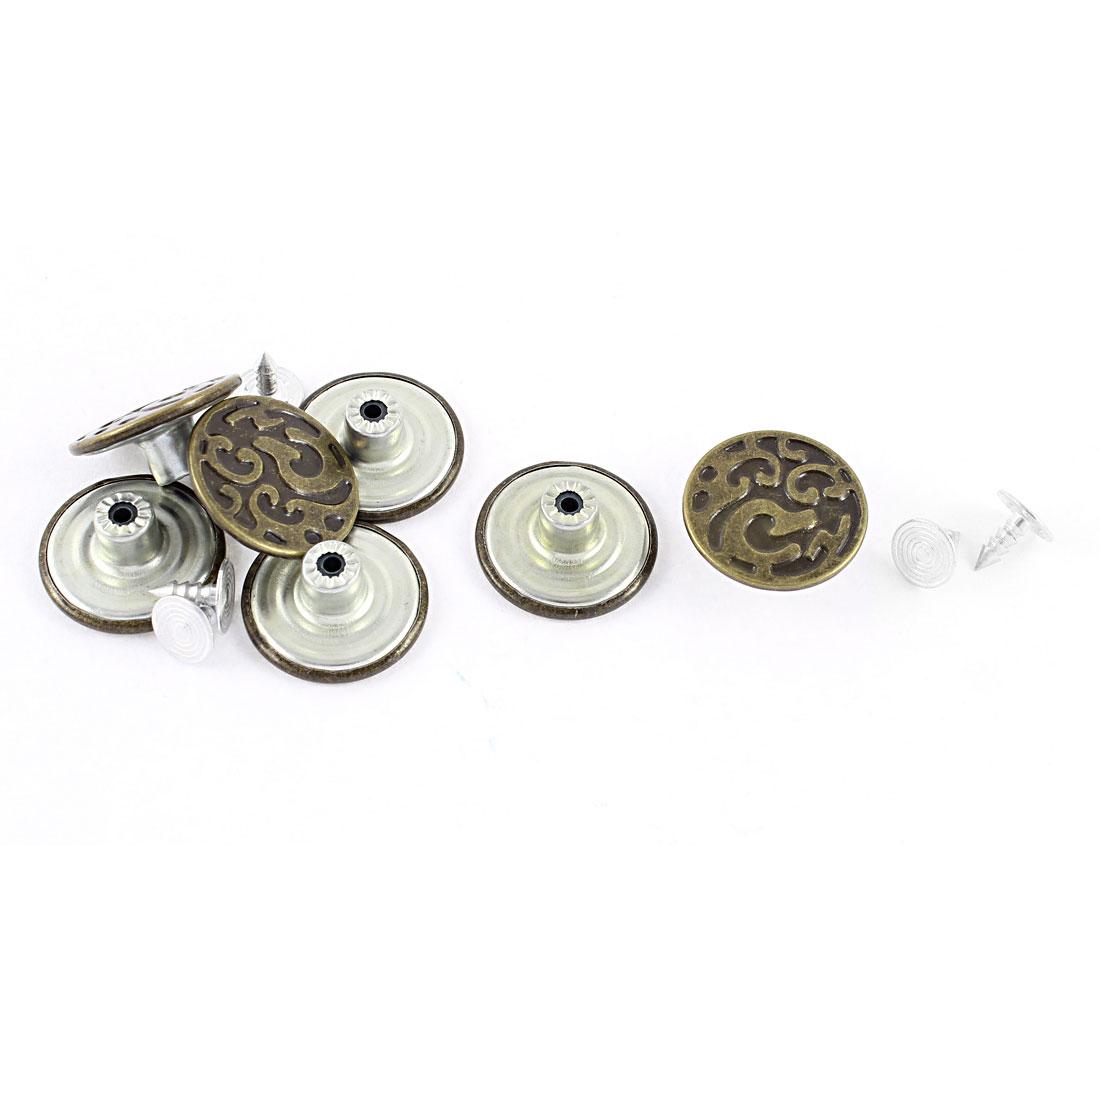 7 Pcs Bronze Tone Retro Style Unisex Jean Buttons 20 x 8mm w Tacks